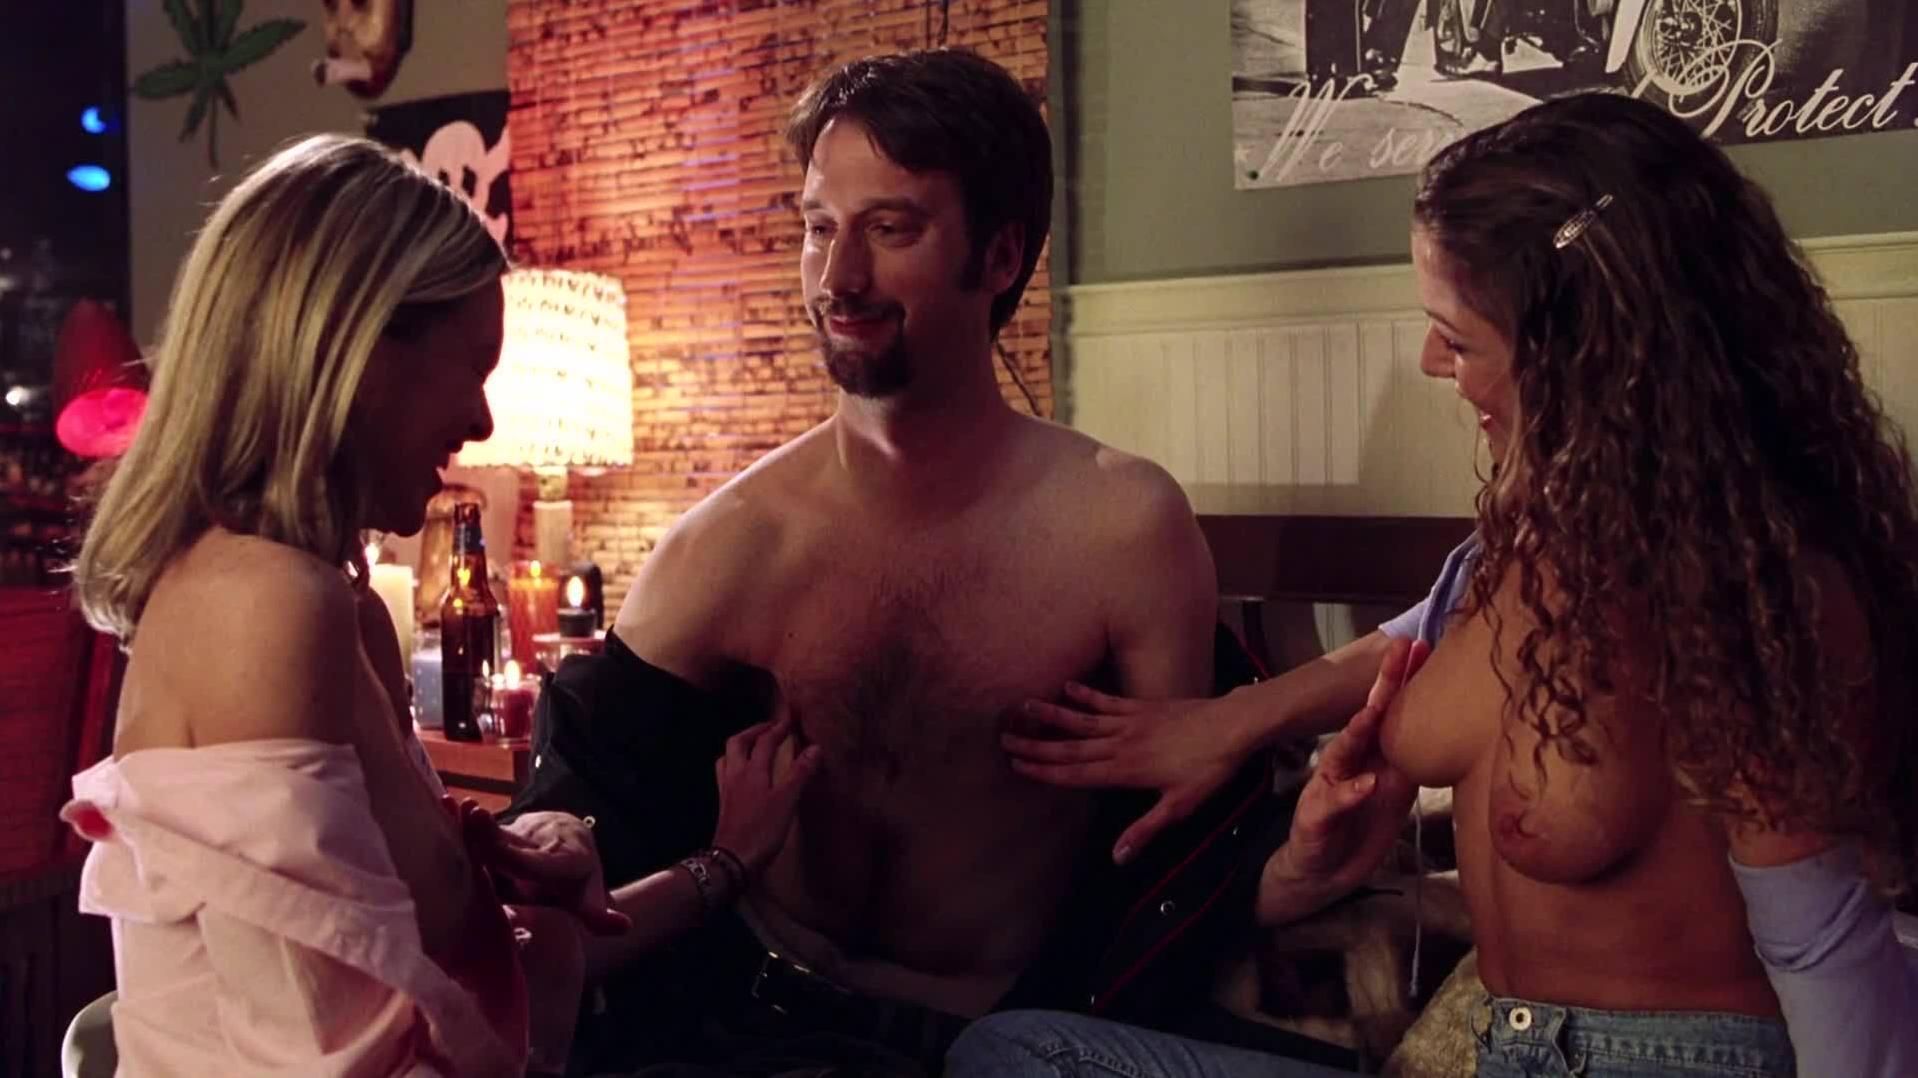 Amanda Logue Nude bridgett wise aerica damaro road trip bluray1080p sex scene